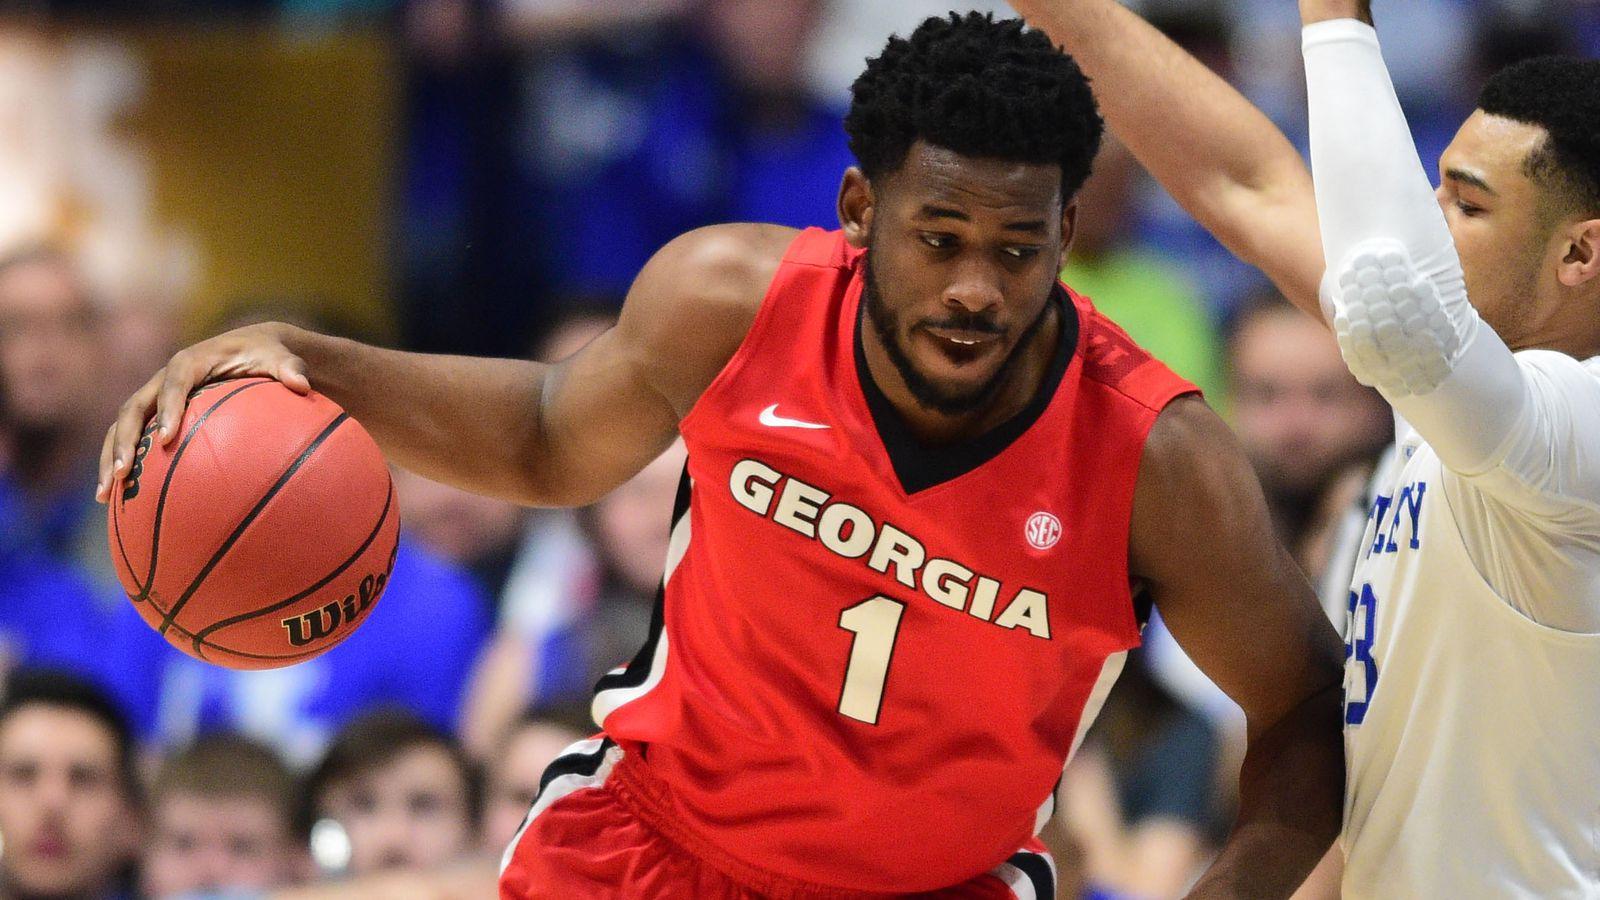 Kentucky Basketball Announces Tv Schedule Game Times And: Kentucky Basketball Vs Georgia: Game Time, TV Schedule